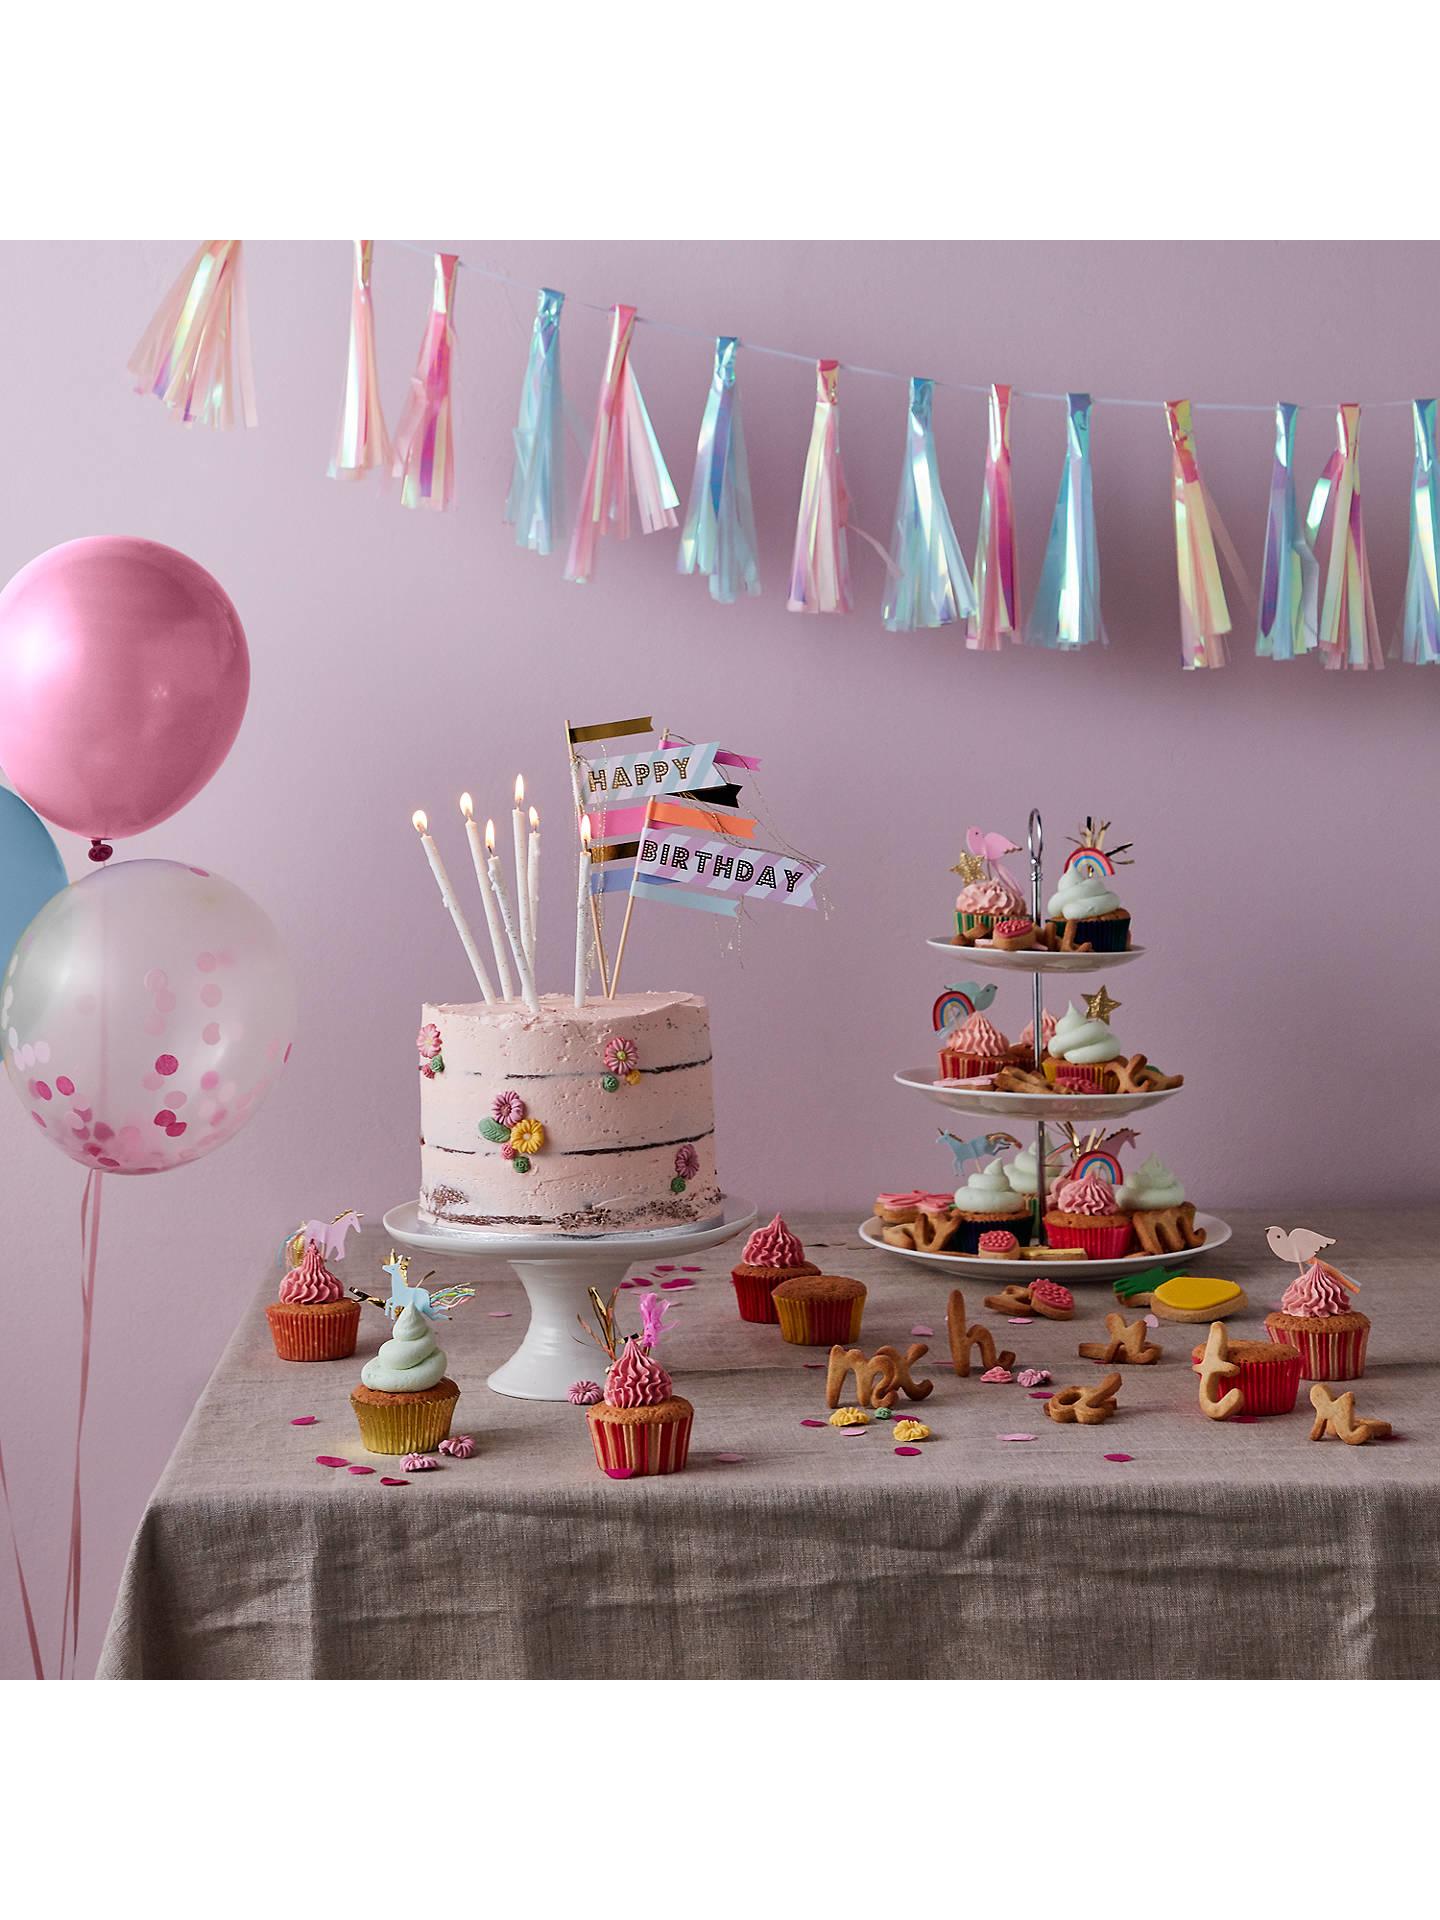 Verjaardagskaarsen Glitter Goud-4